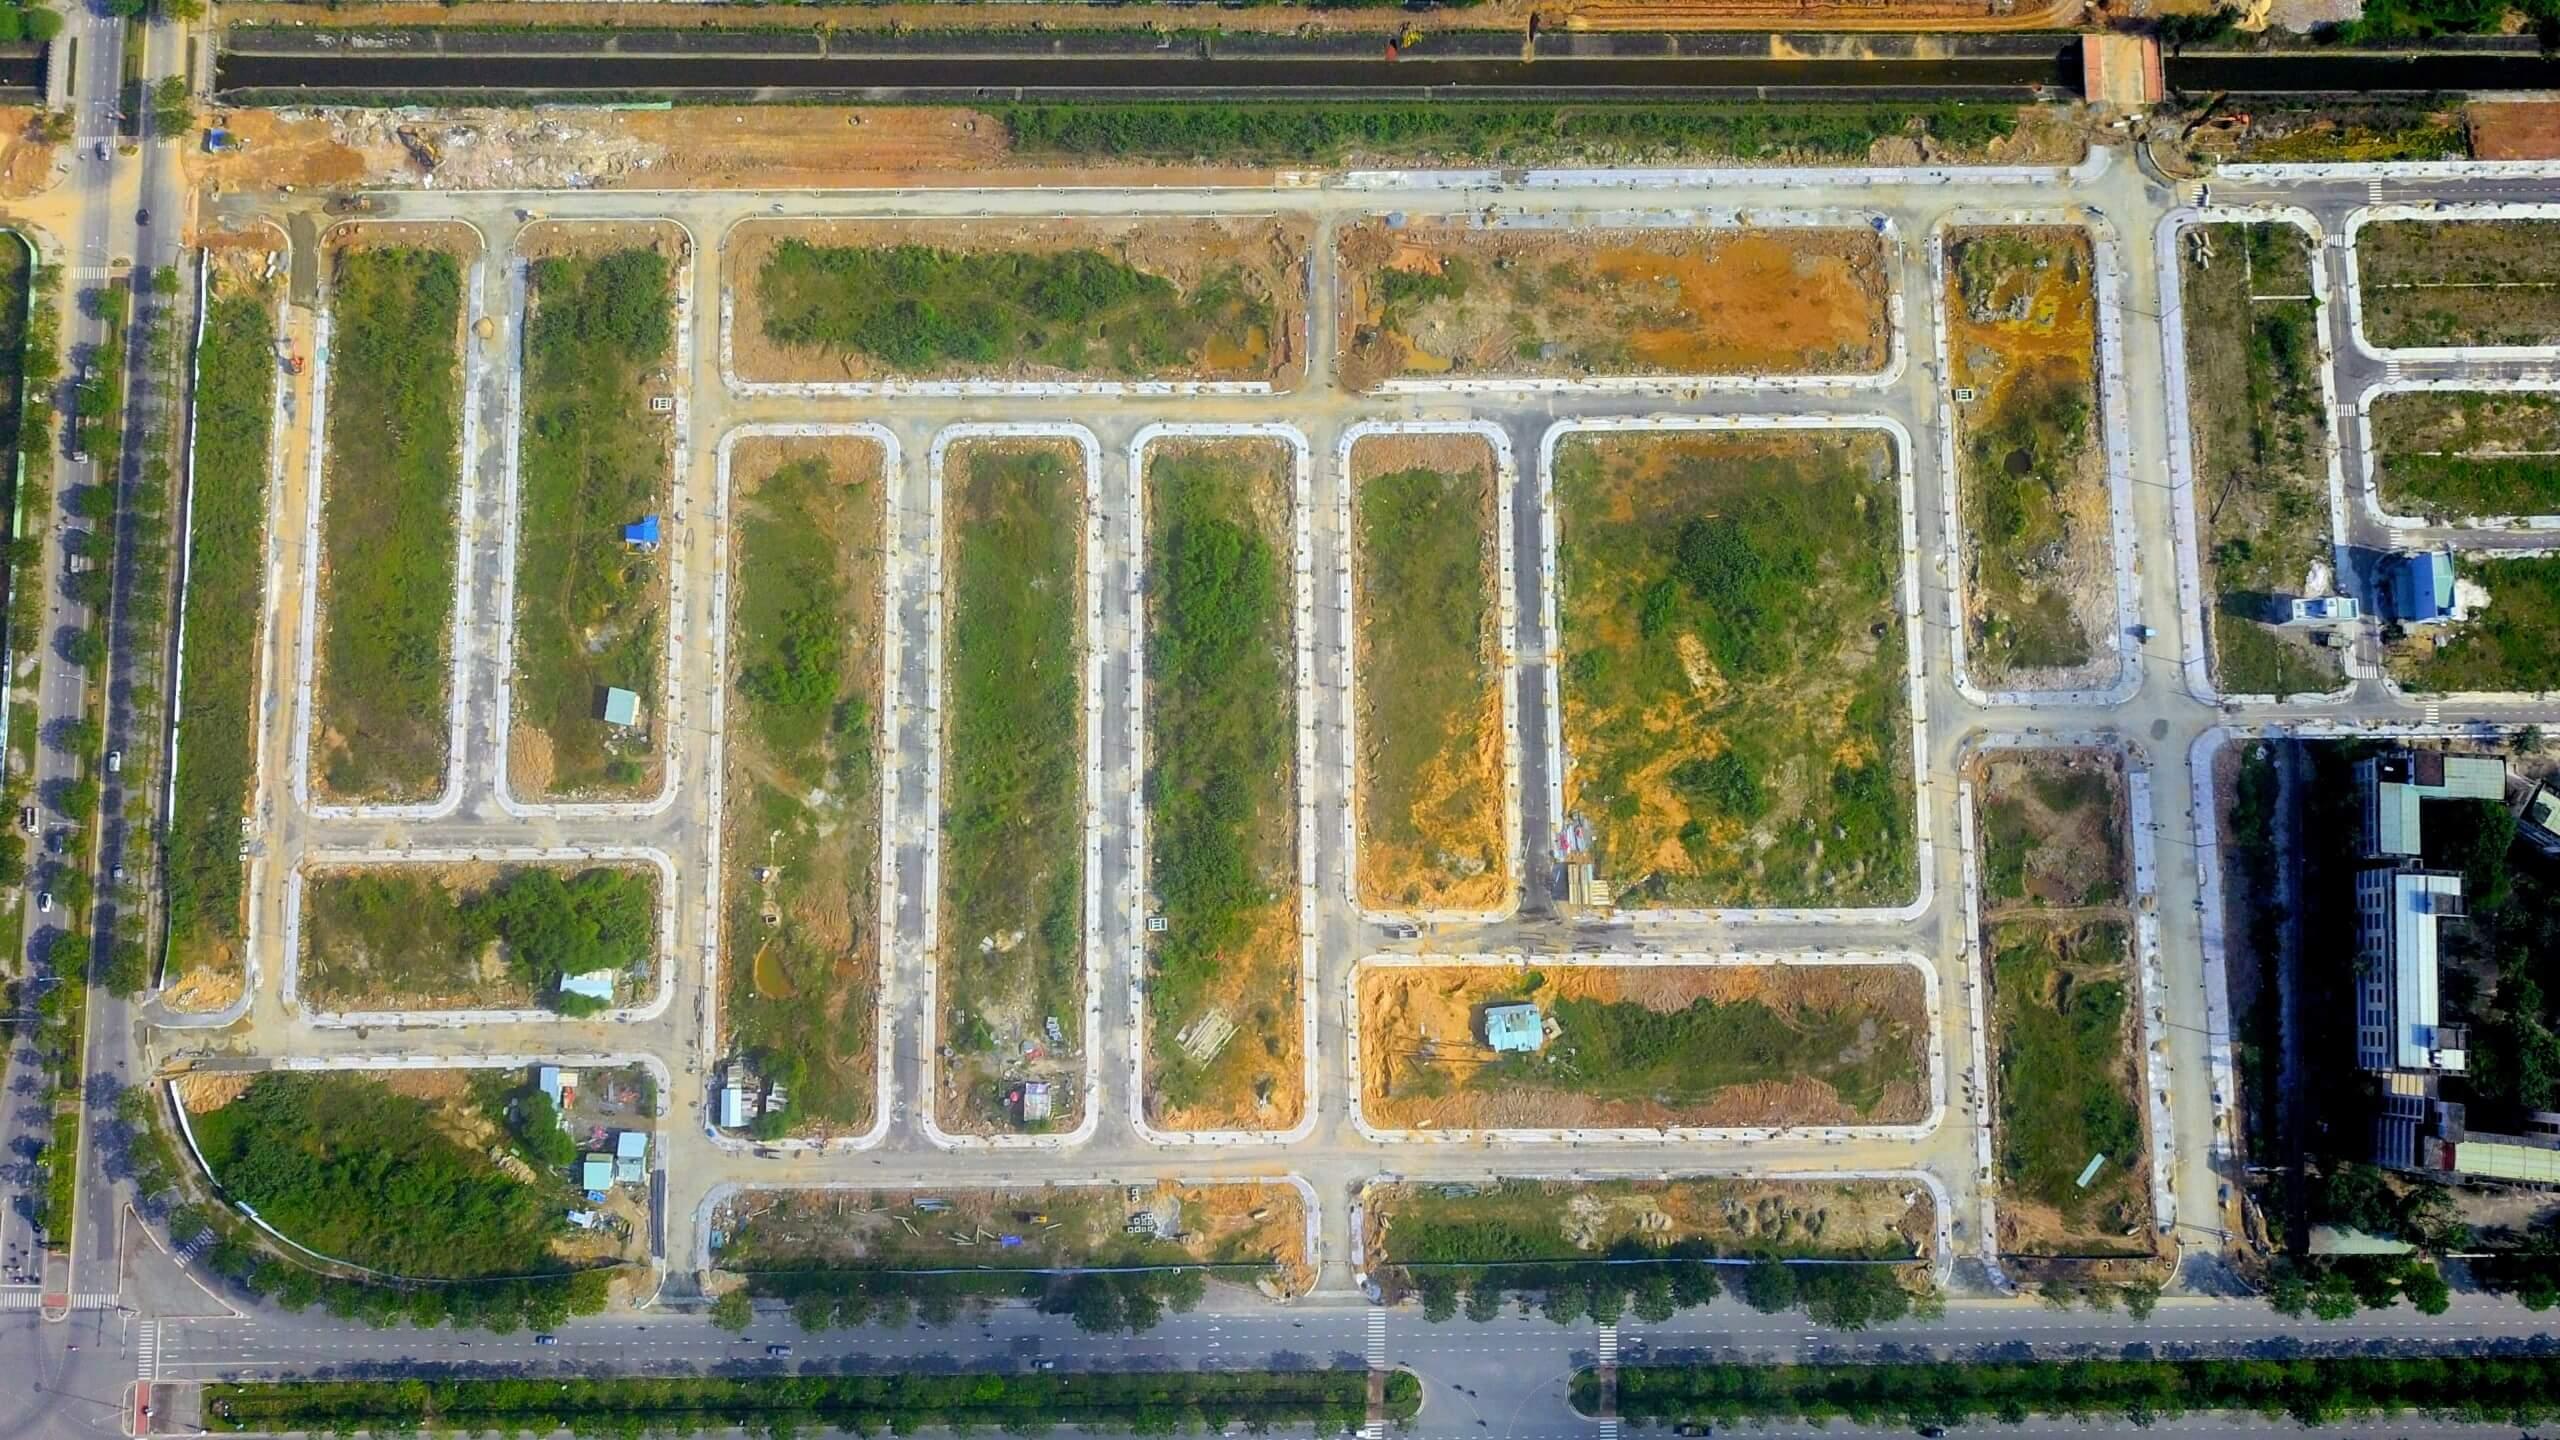 tiến đô khu E kim long city flycam